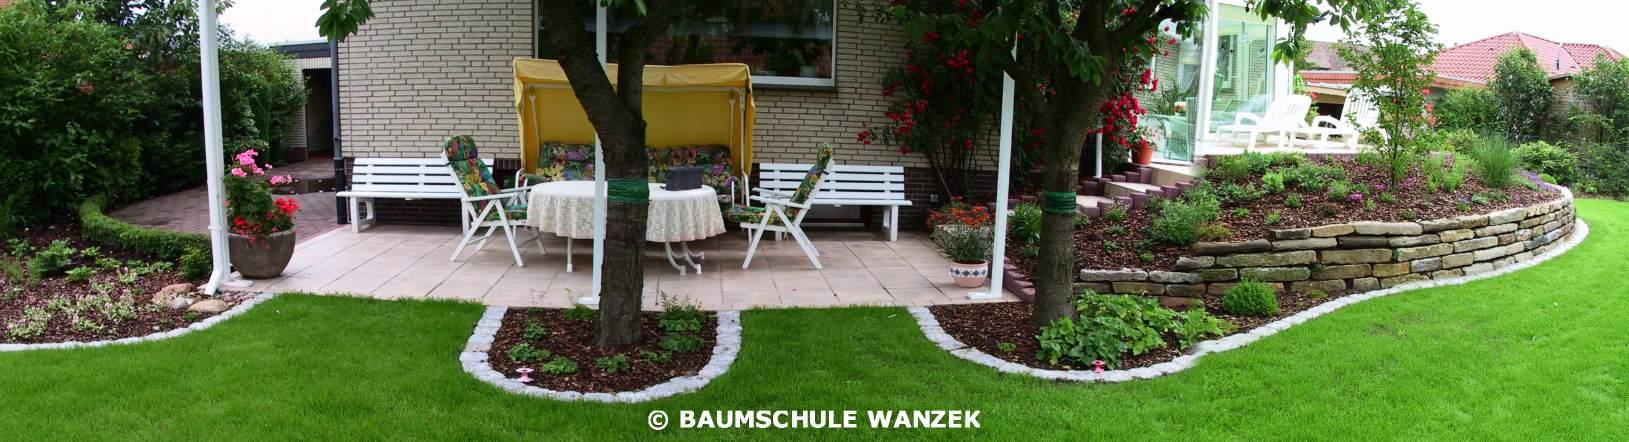 Baumschule Wanzek Gartengestaltung